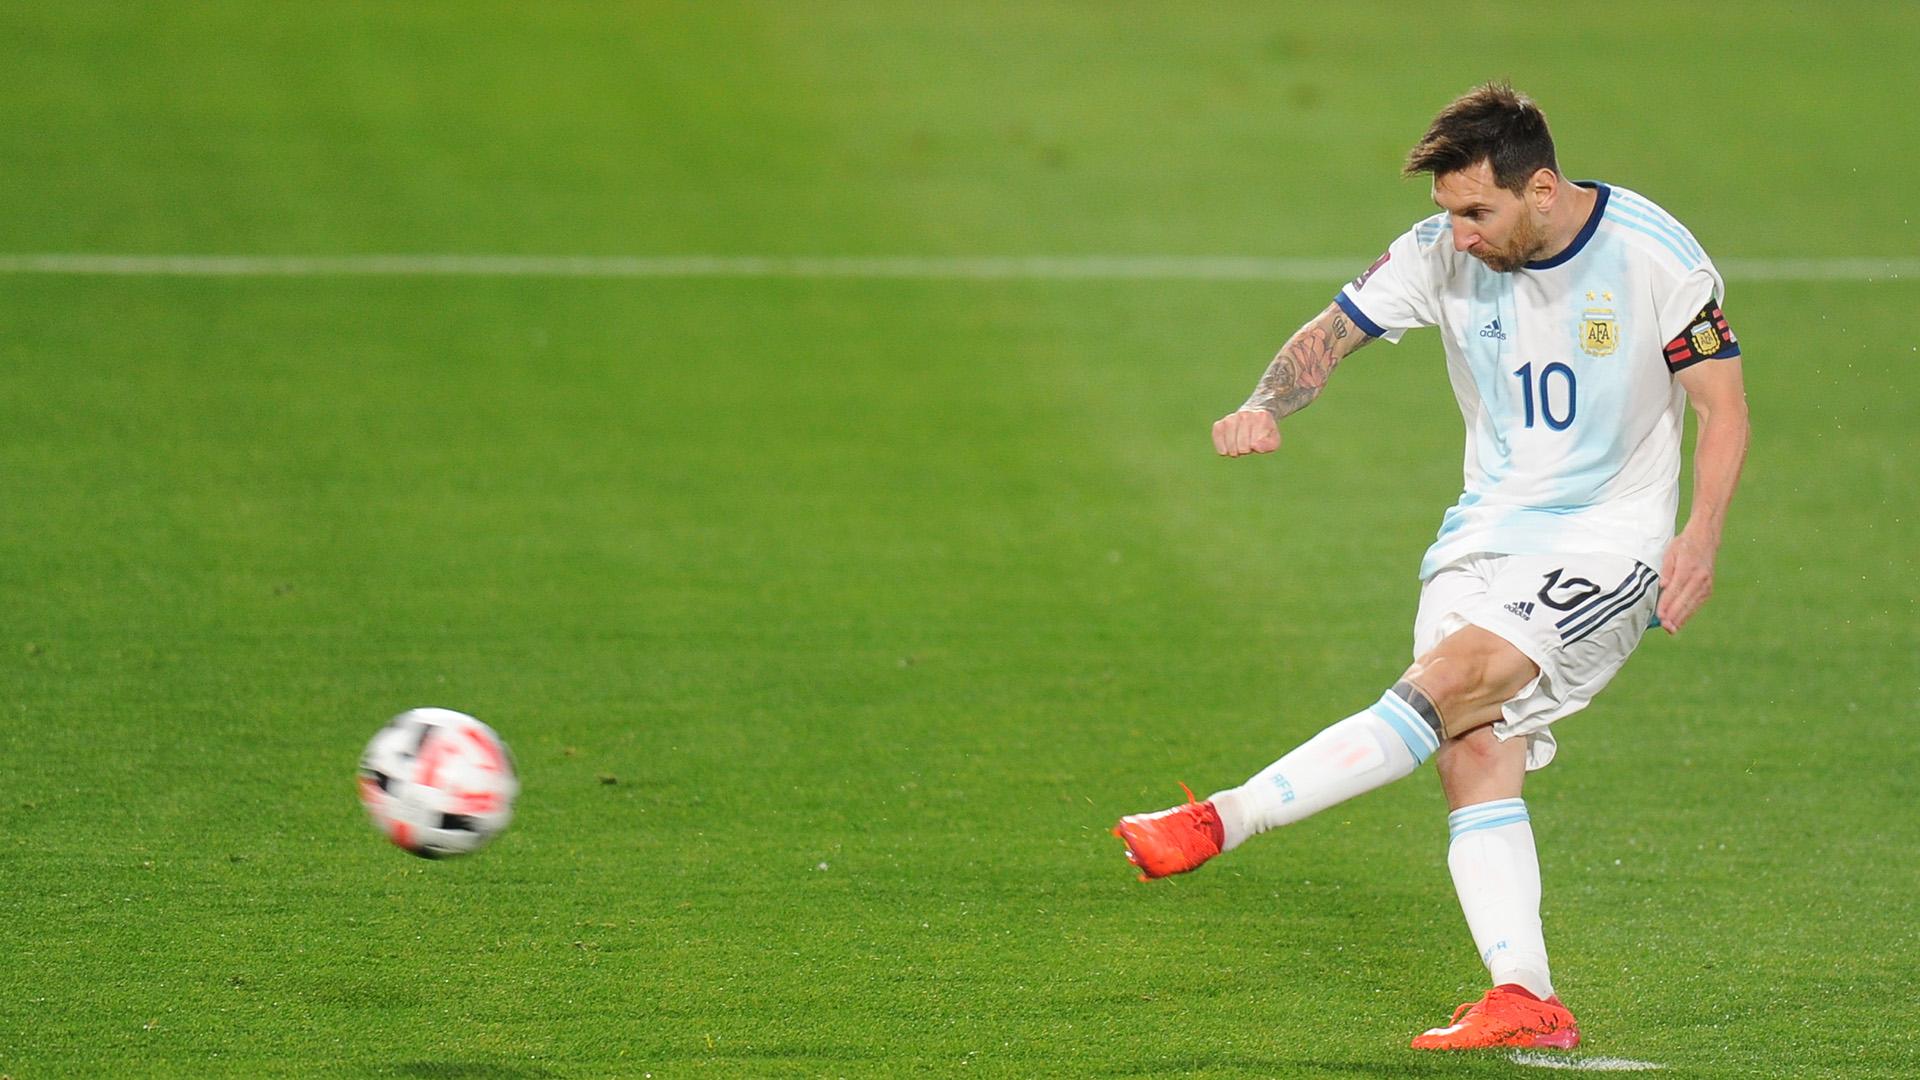 La pelota se llena de la zurda de Messi en el 1-0 (JUANO TESONE / POOL)